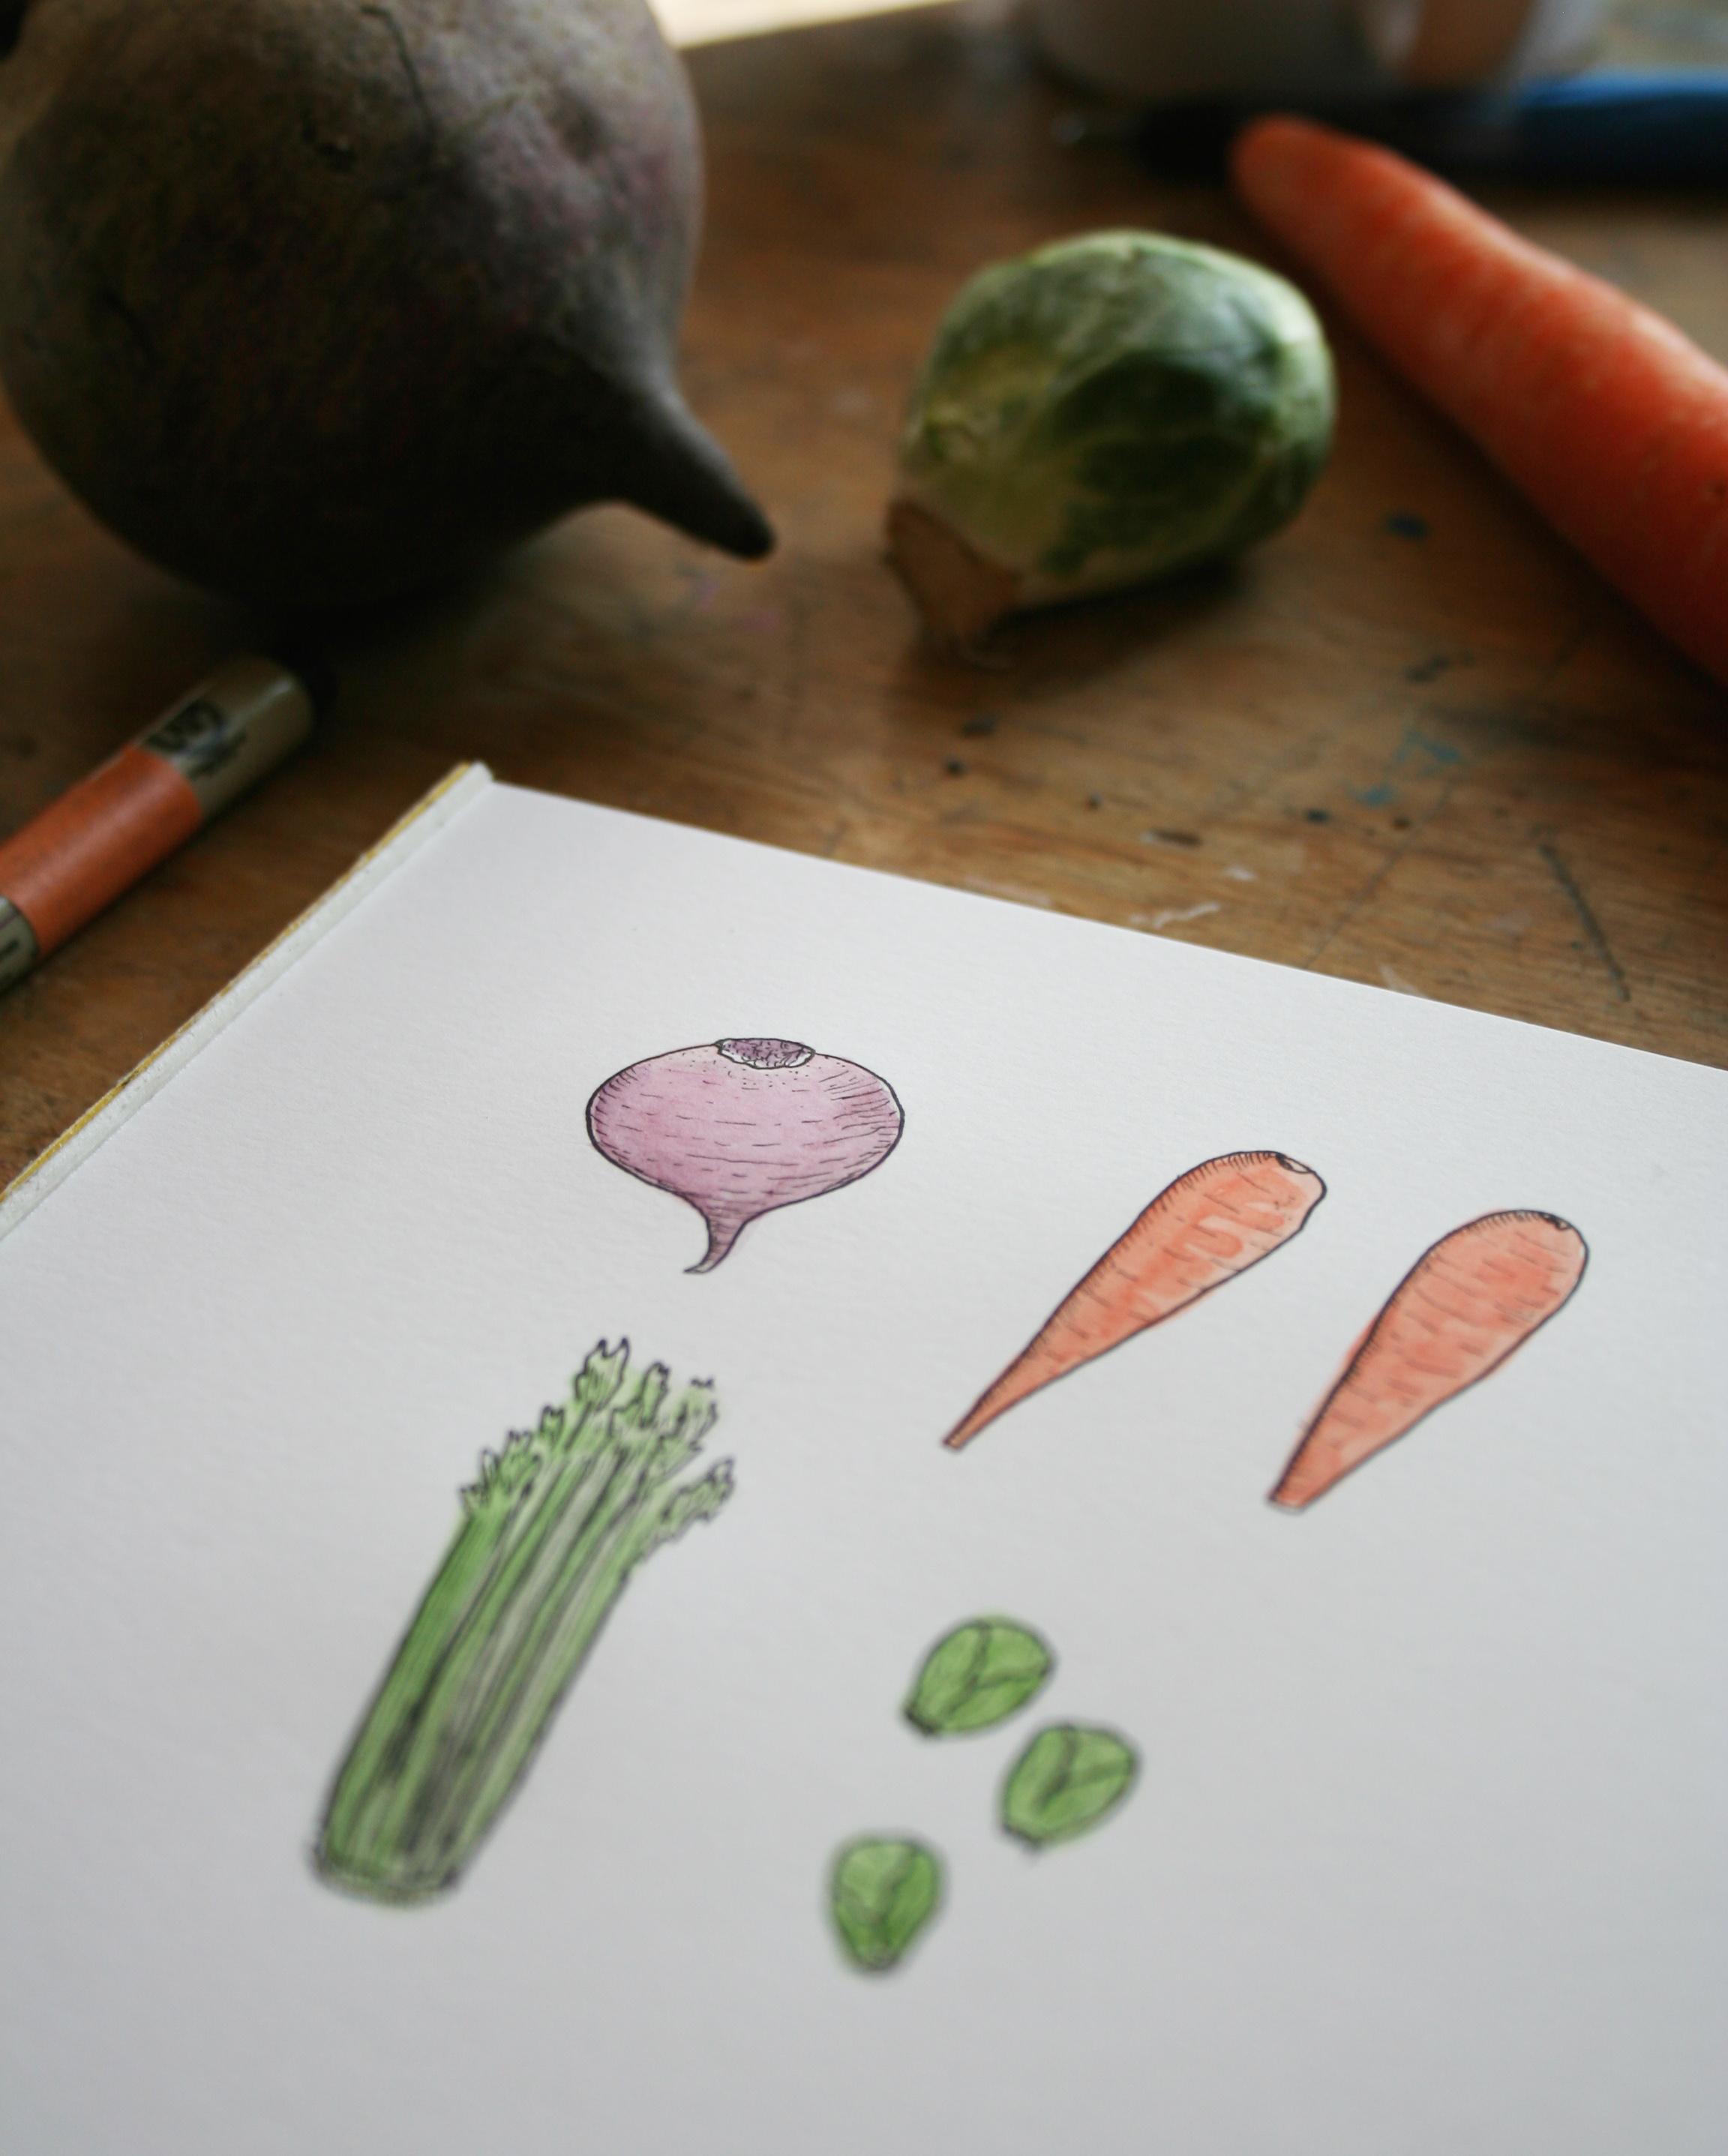 Drawn vegetable veggie Art to Vegetables Healthy: How